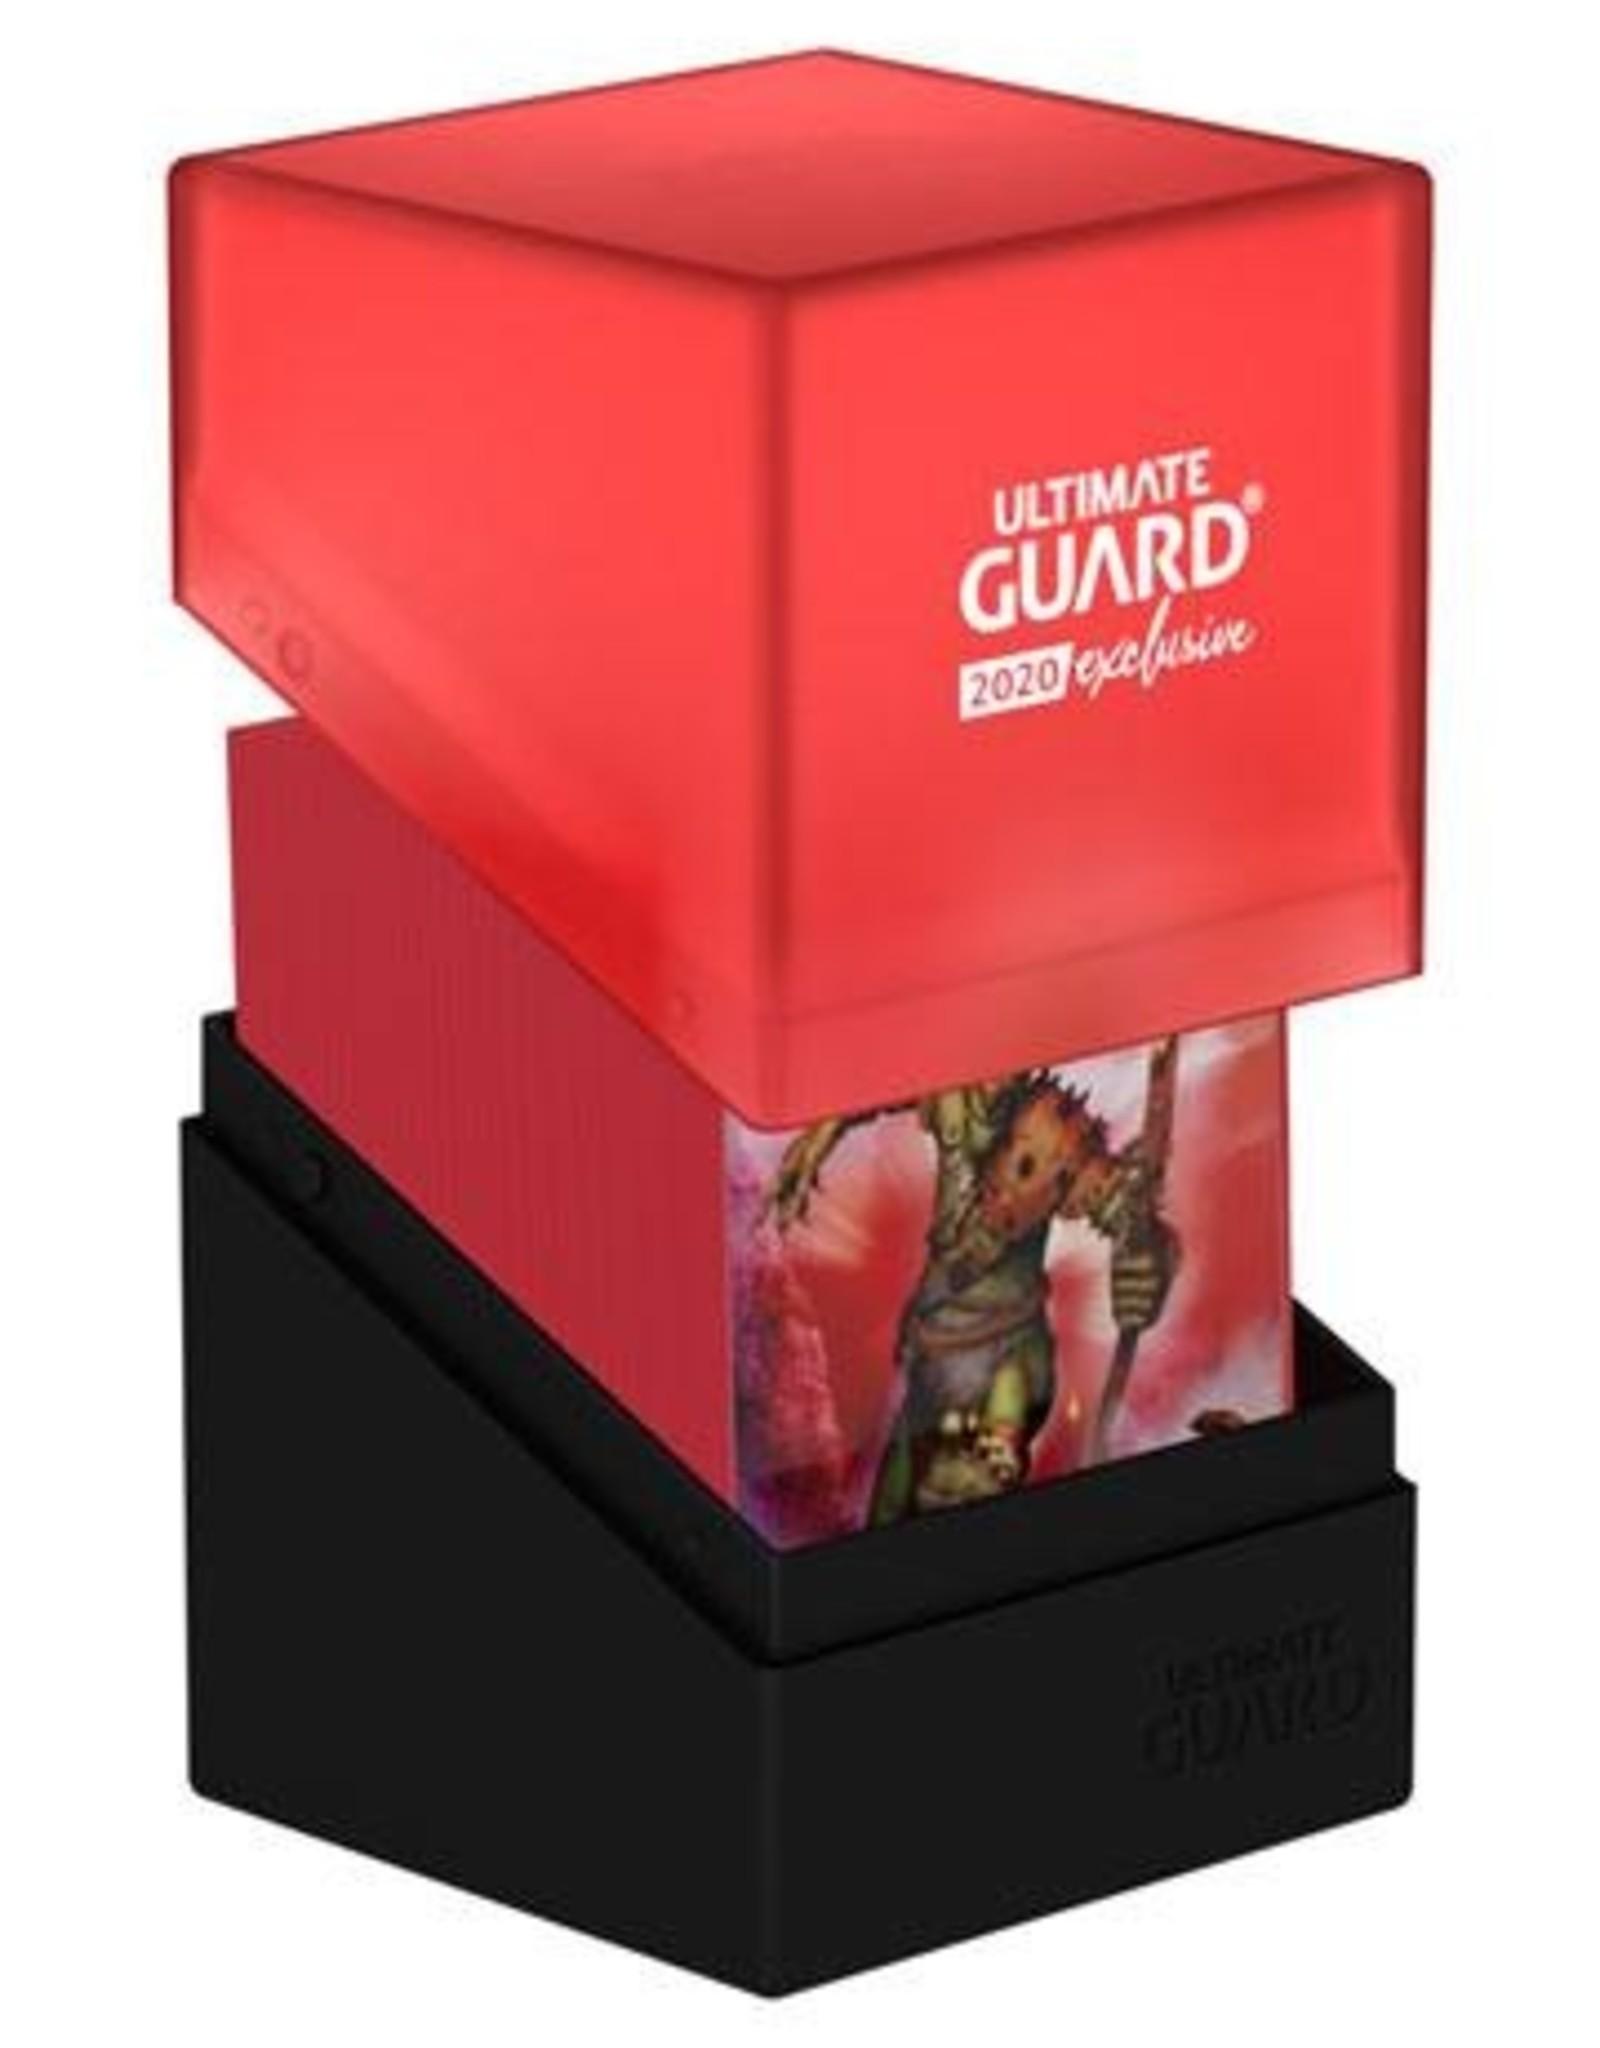 Ultimate Guard Boulder Deck Case Black/Red 2020 Exclusive 100+